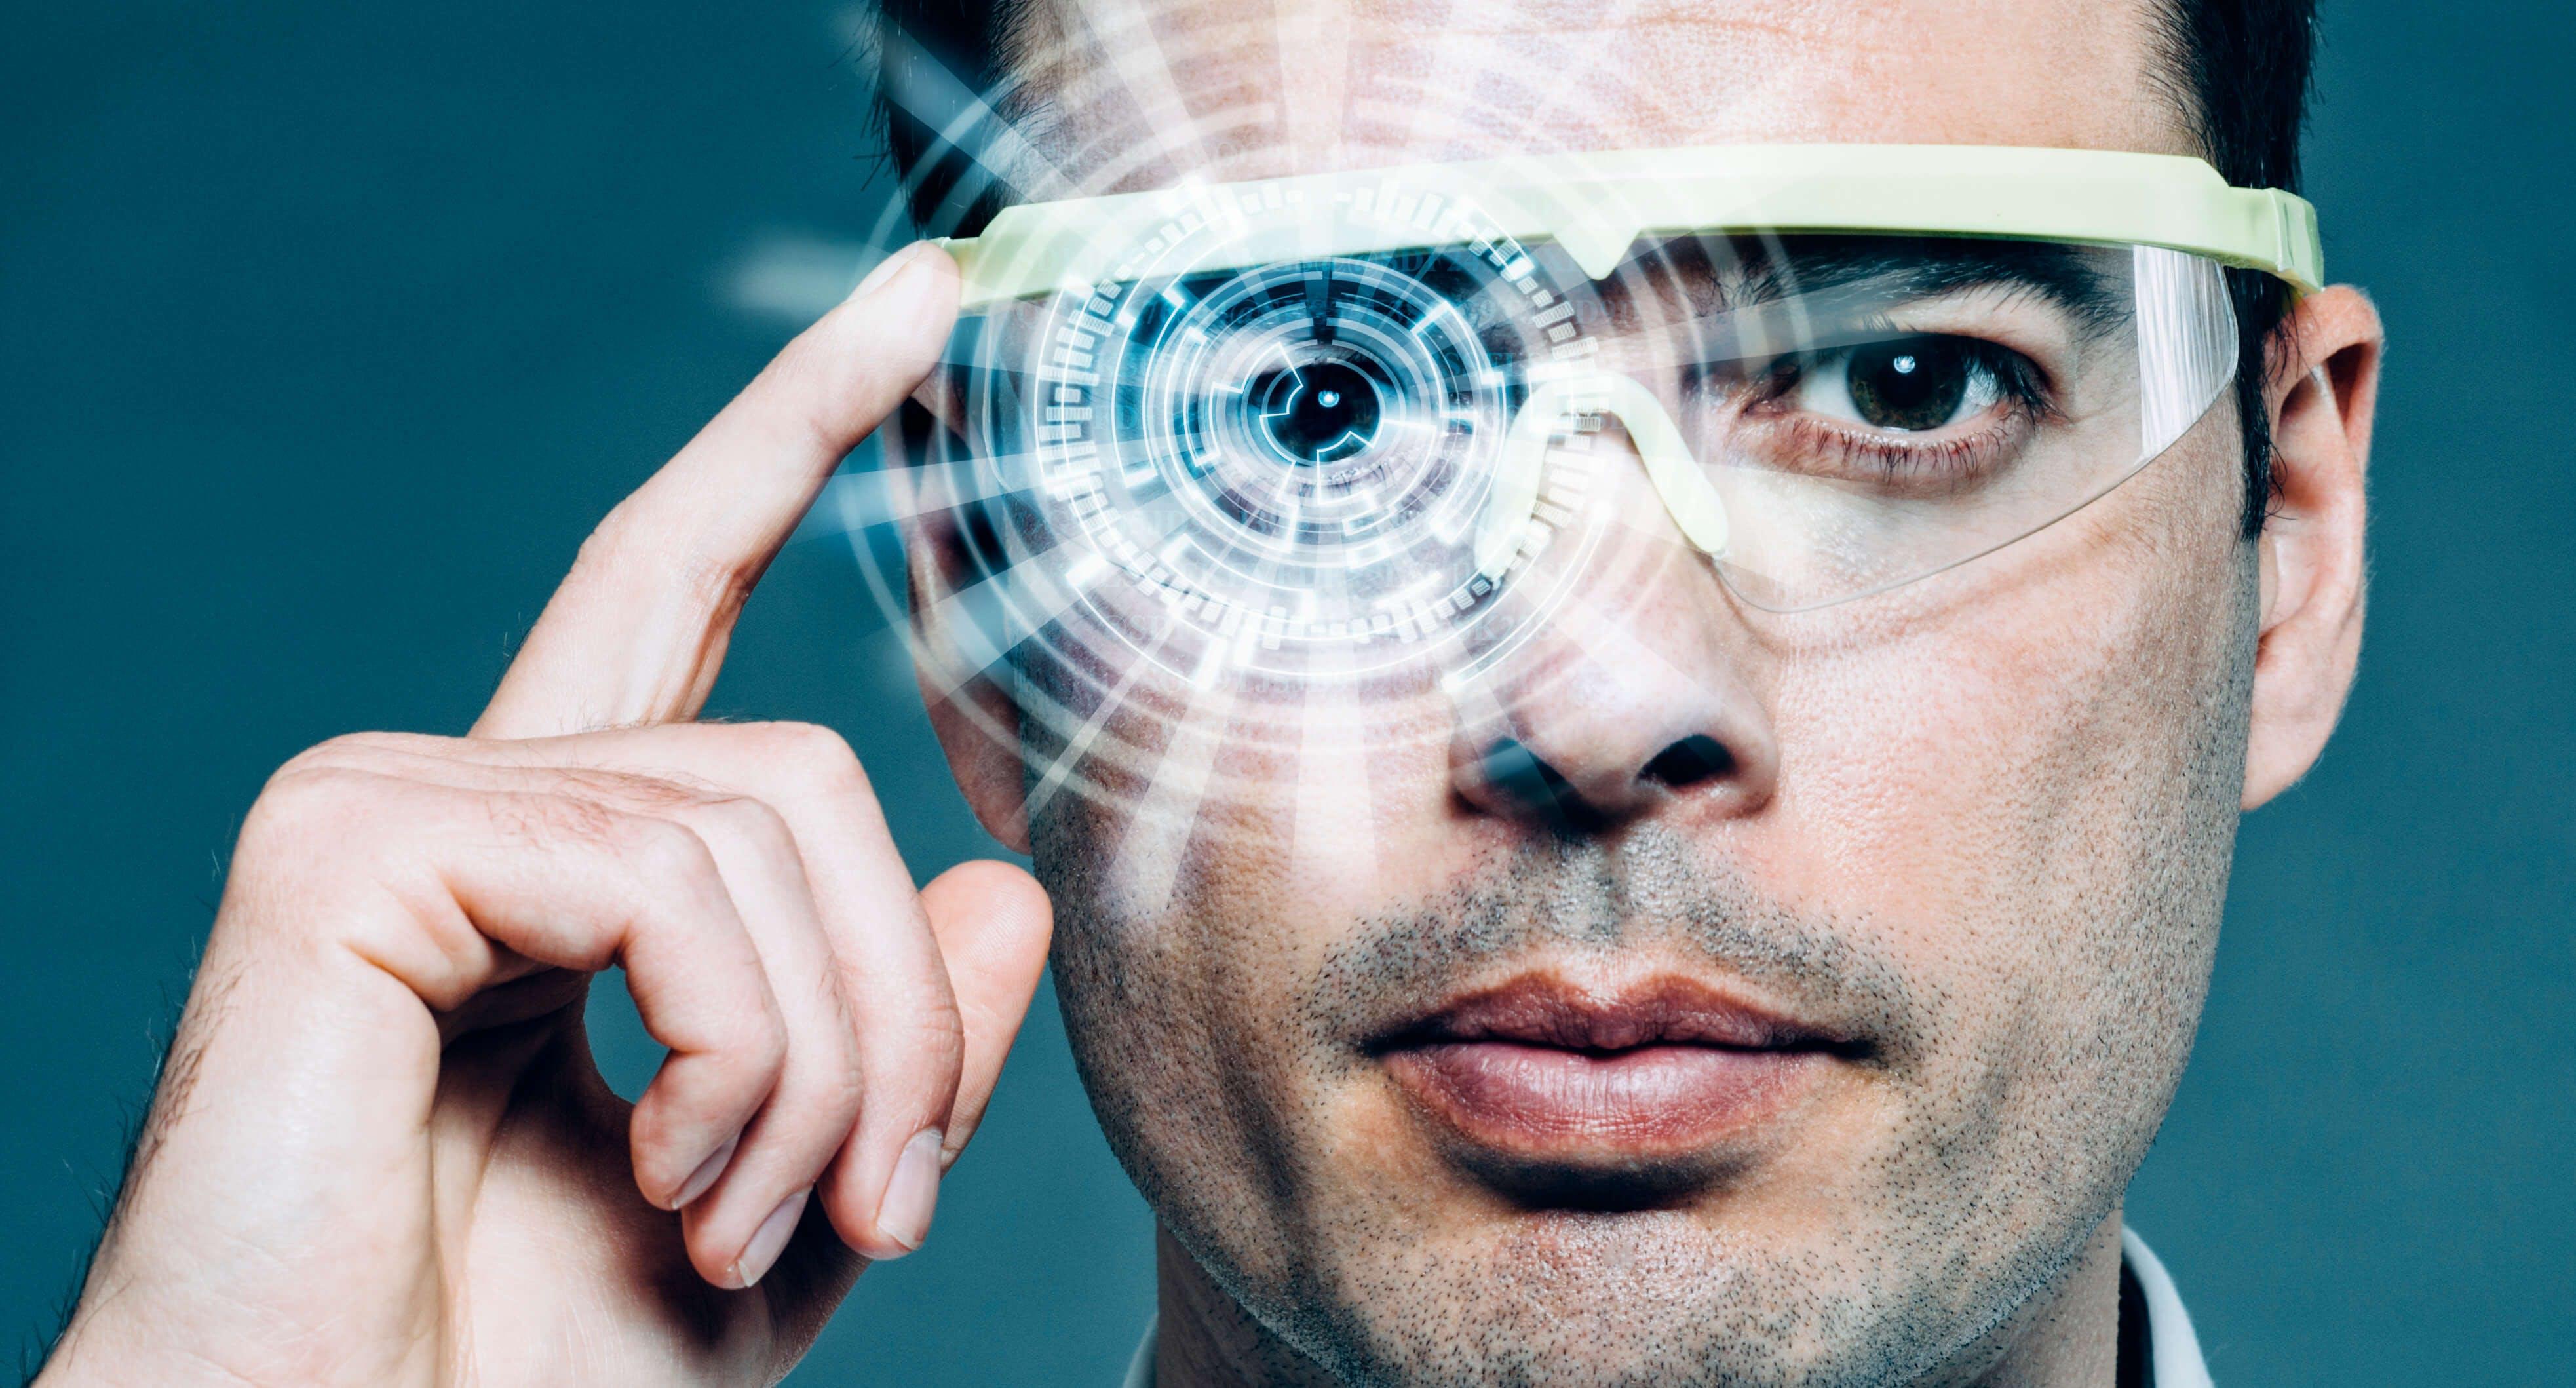 Titelbild-Datenbrille-Google-Glass-High-Tech-iStock-471883878-mikkelwilliam